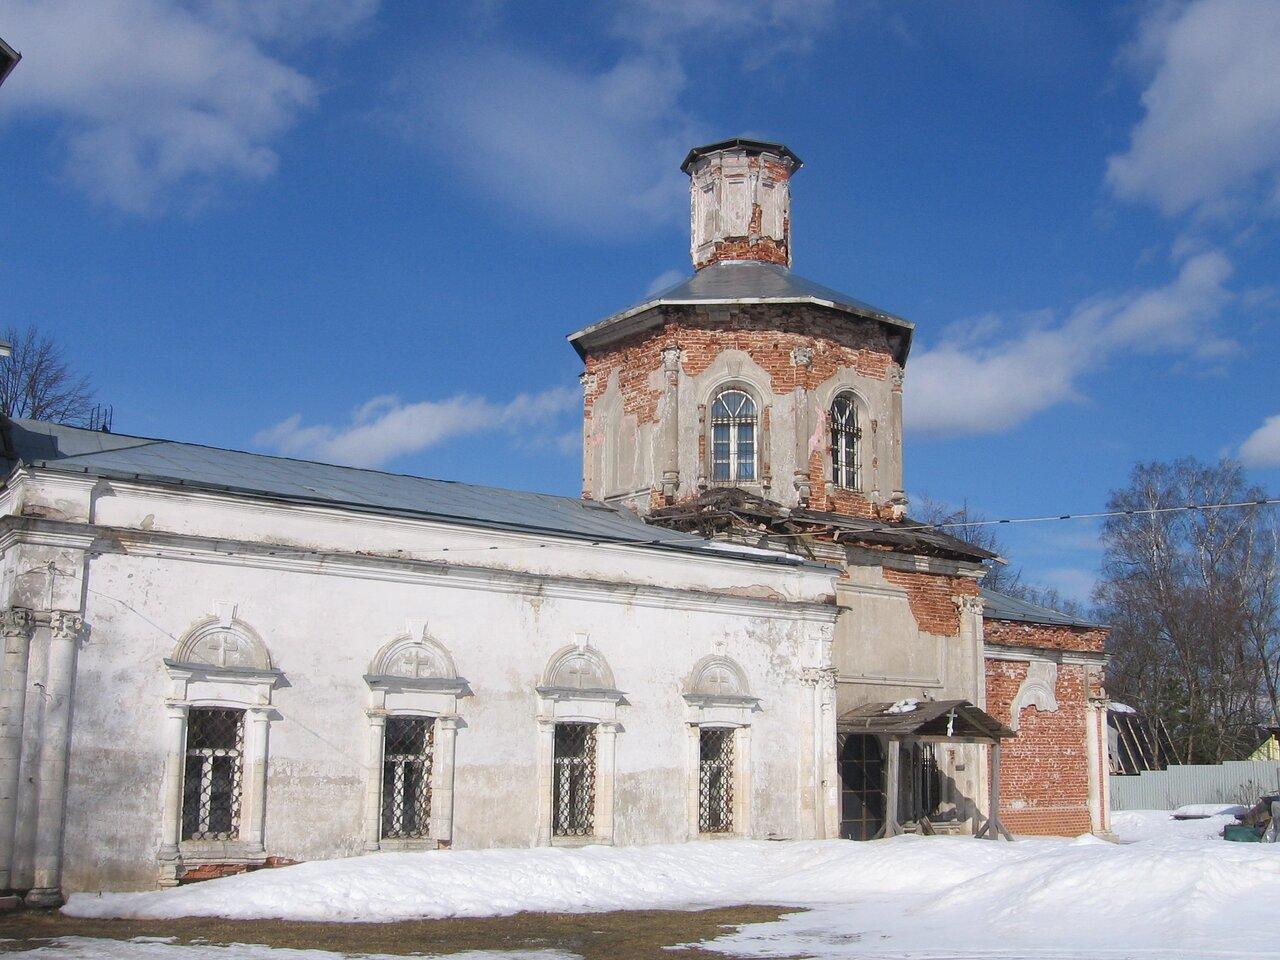 Казанская церковь в Брыньково (Руза)